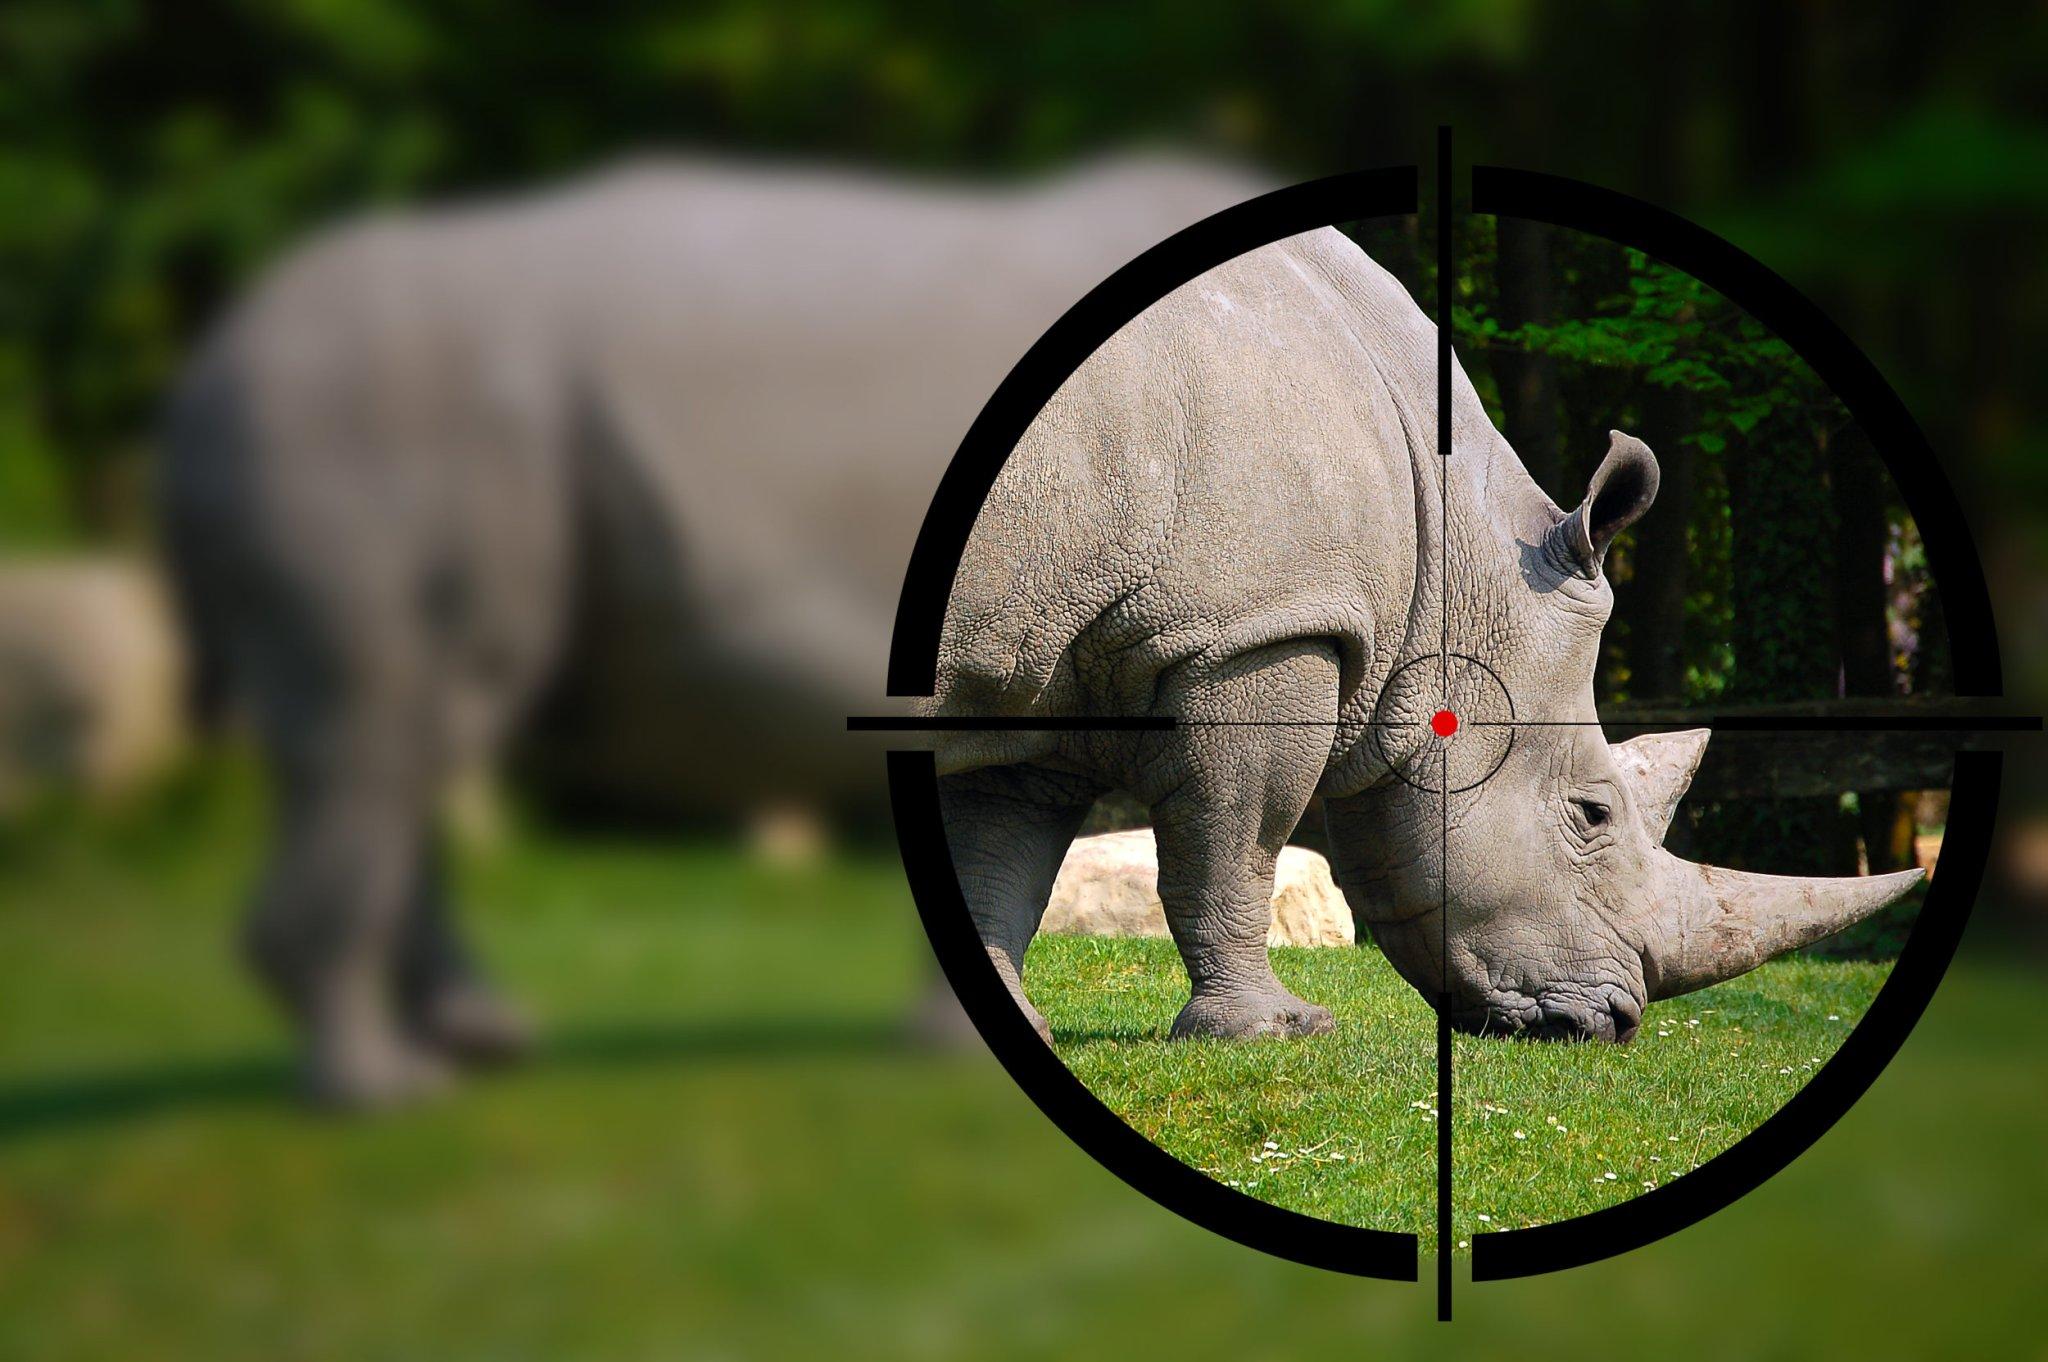 Hefty sentence handed down for Kruger National Park poaching